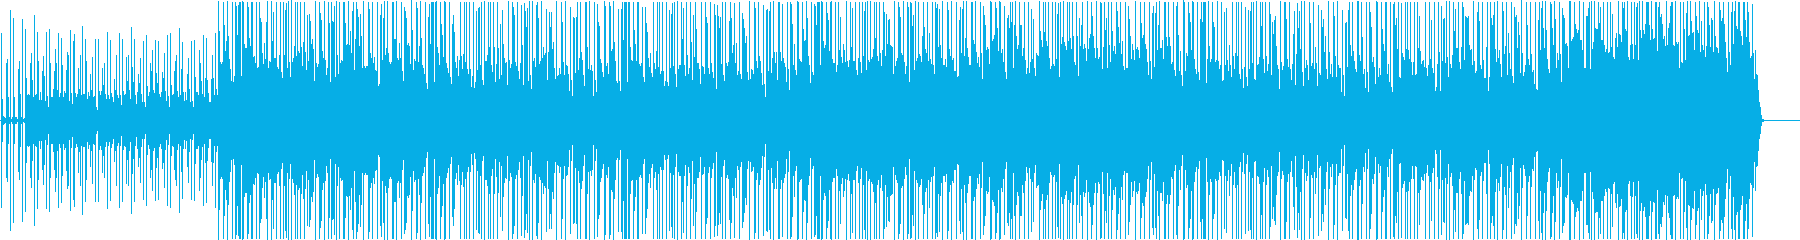 lstの再生済みの波形